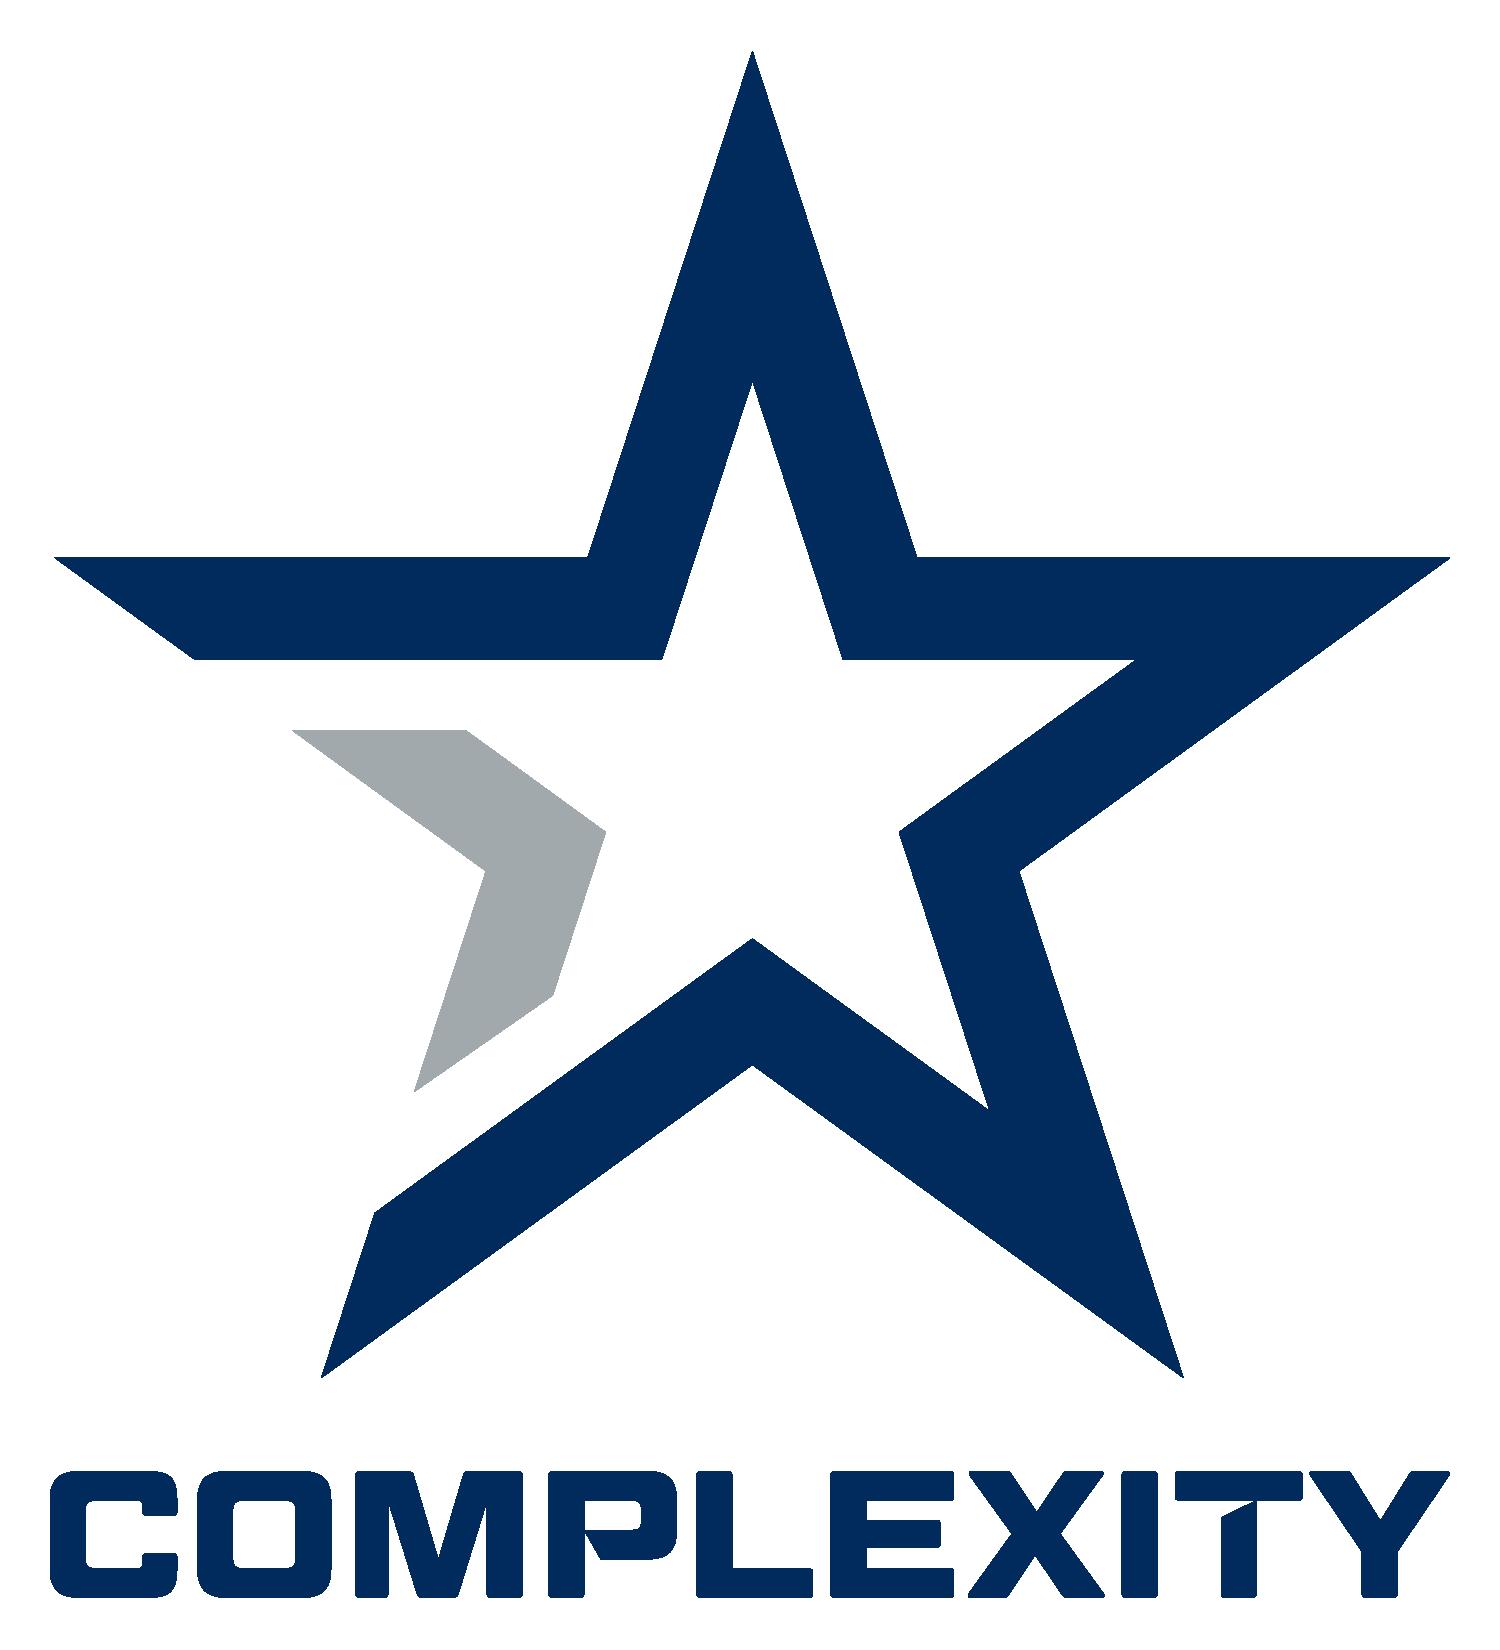 Dota 2 Complexity Gaming Team Logo